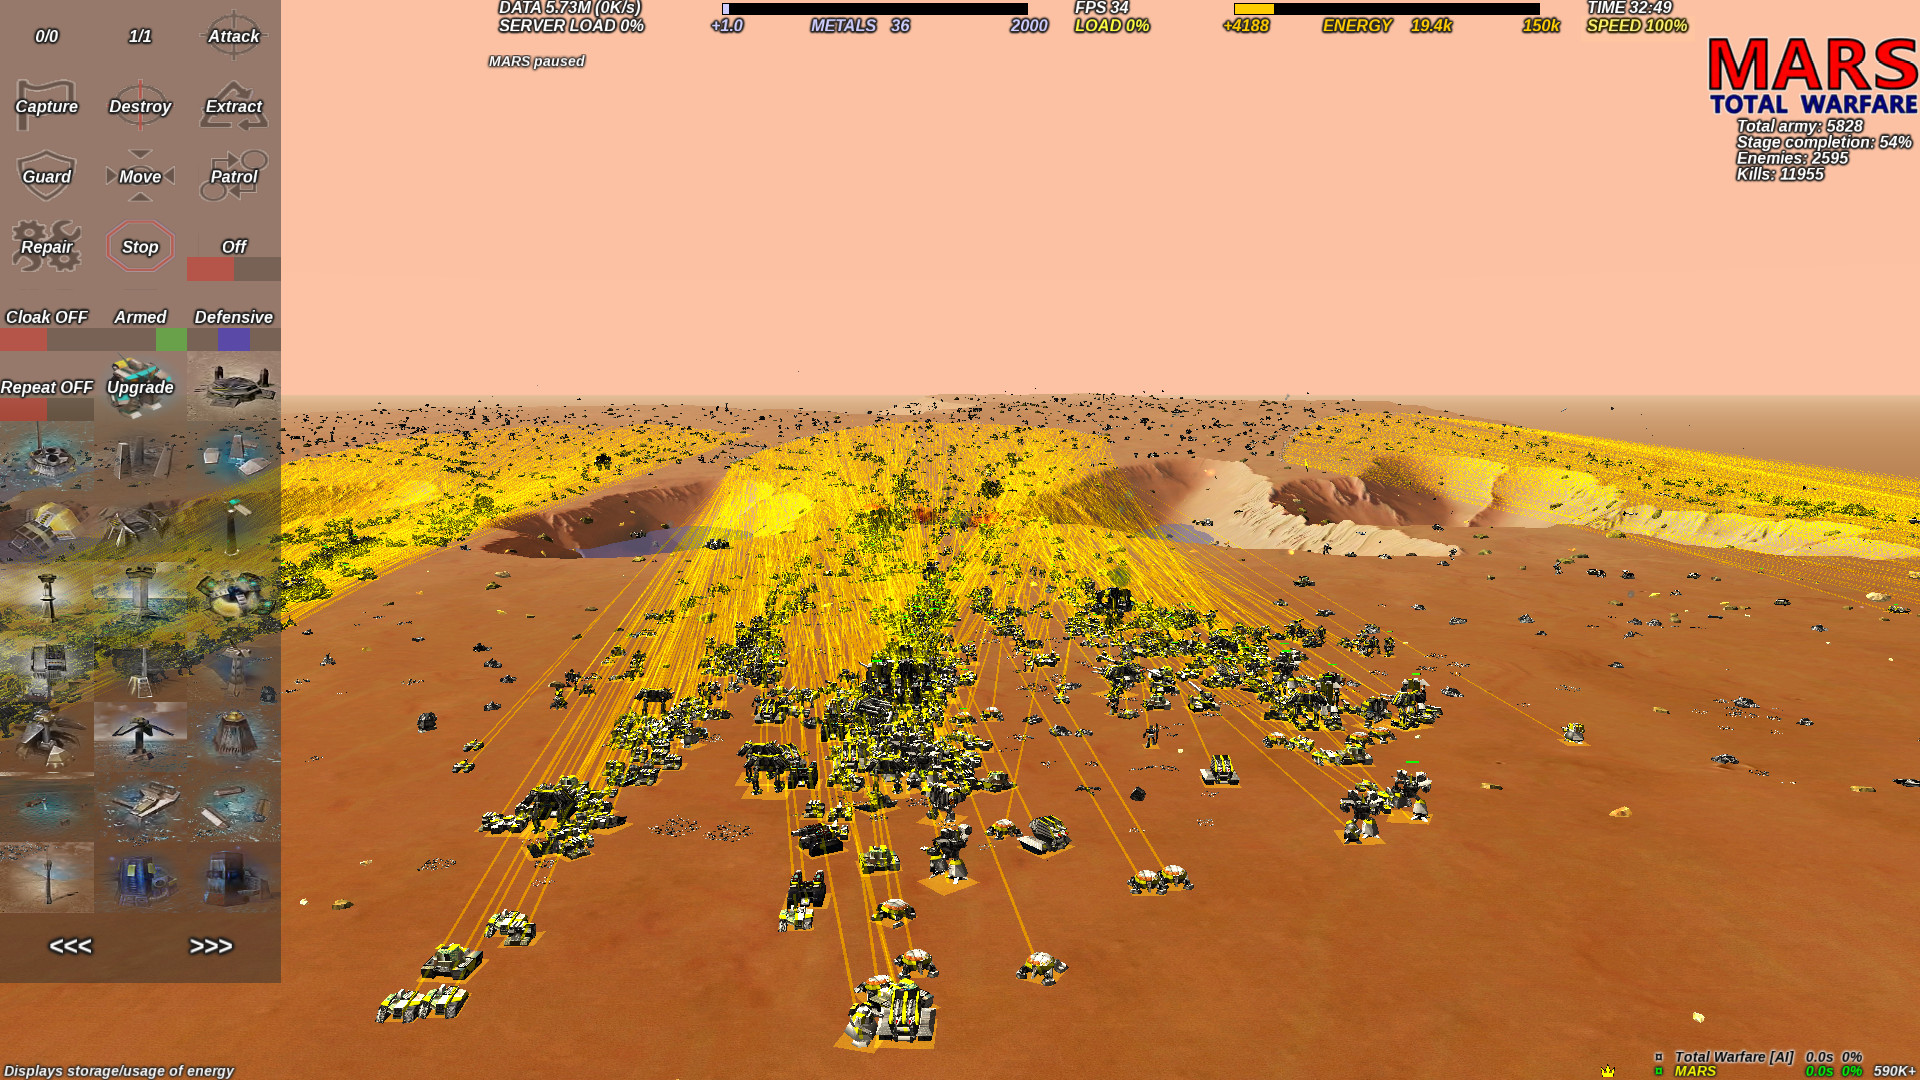 [MARS] Total Warfare - Annual Supervisor upgrade (2019) screenshot